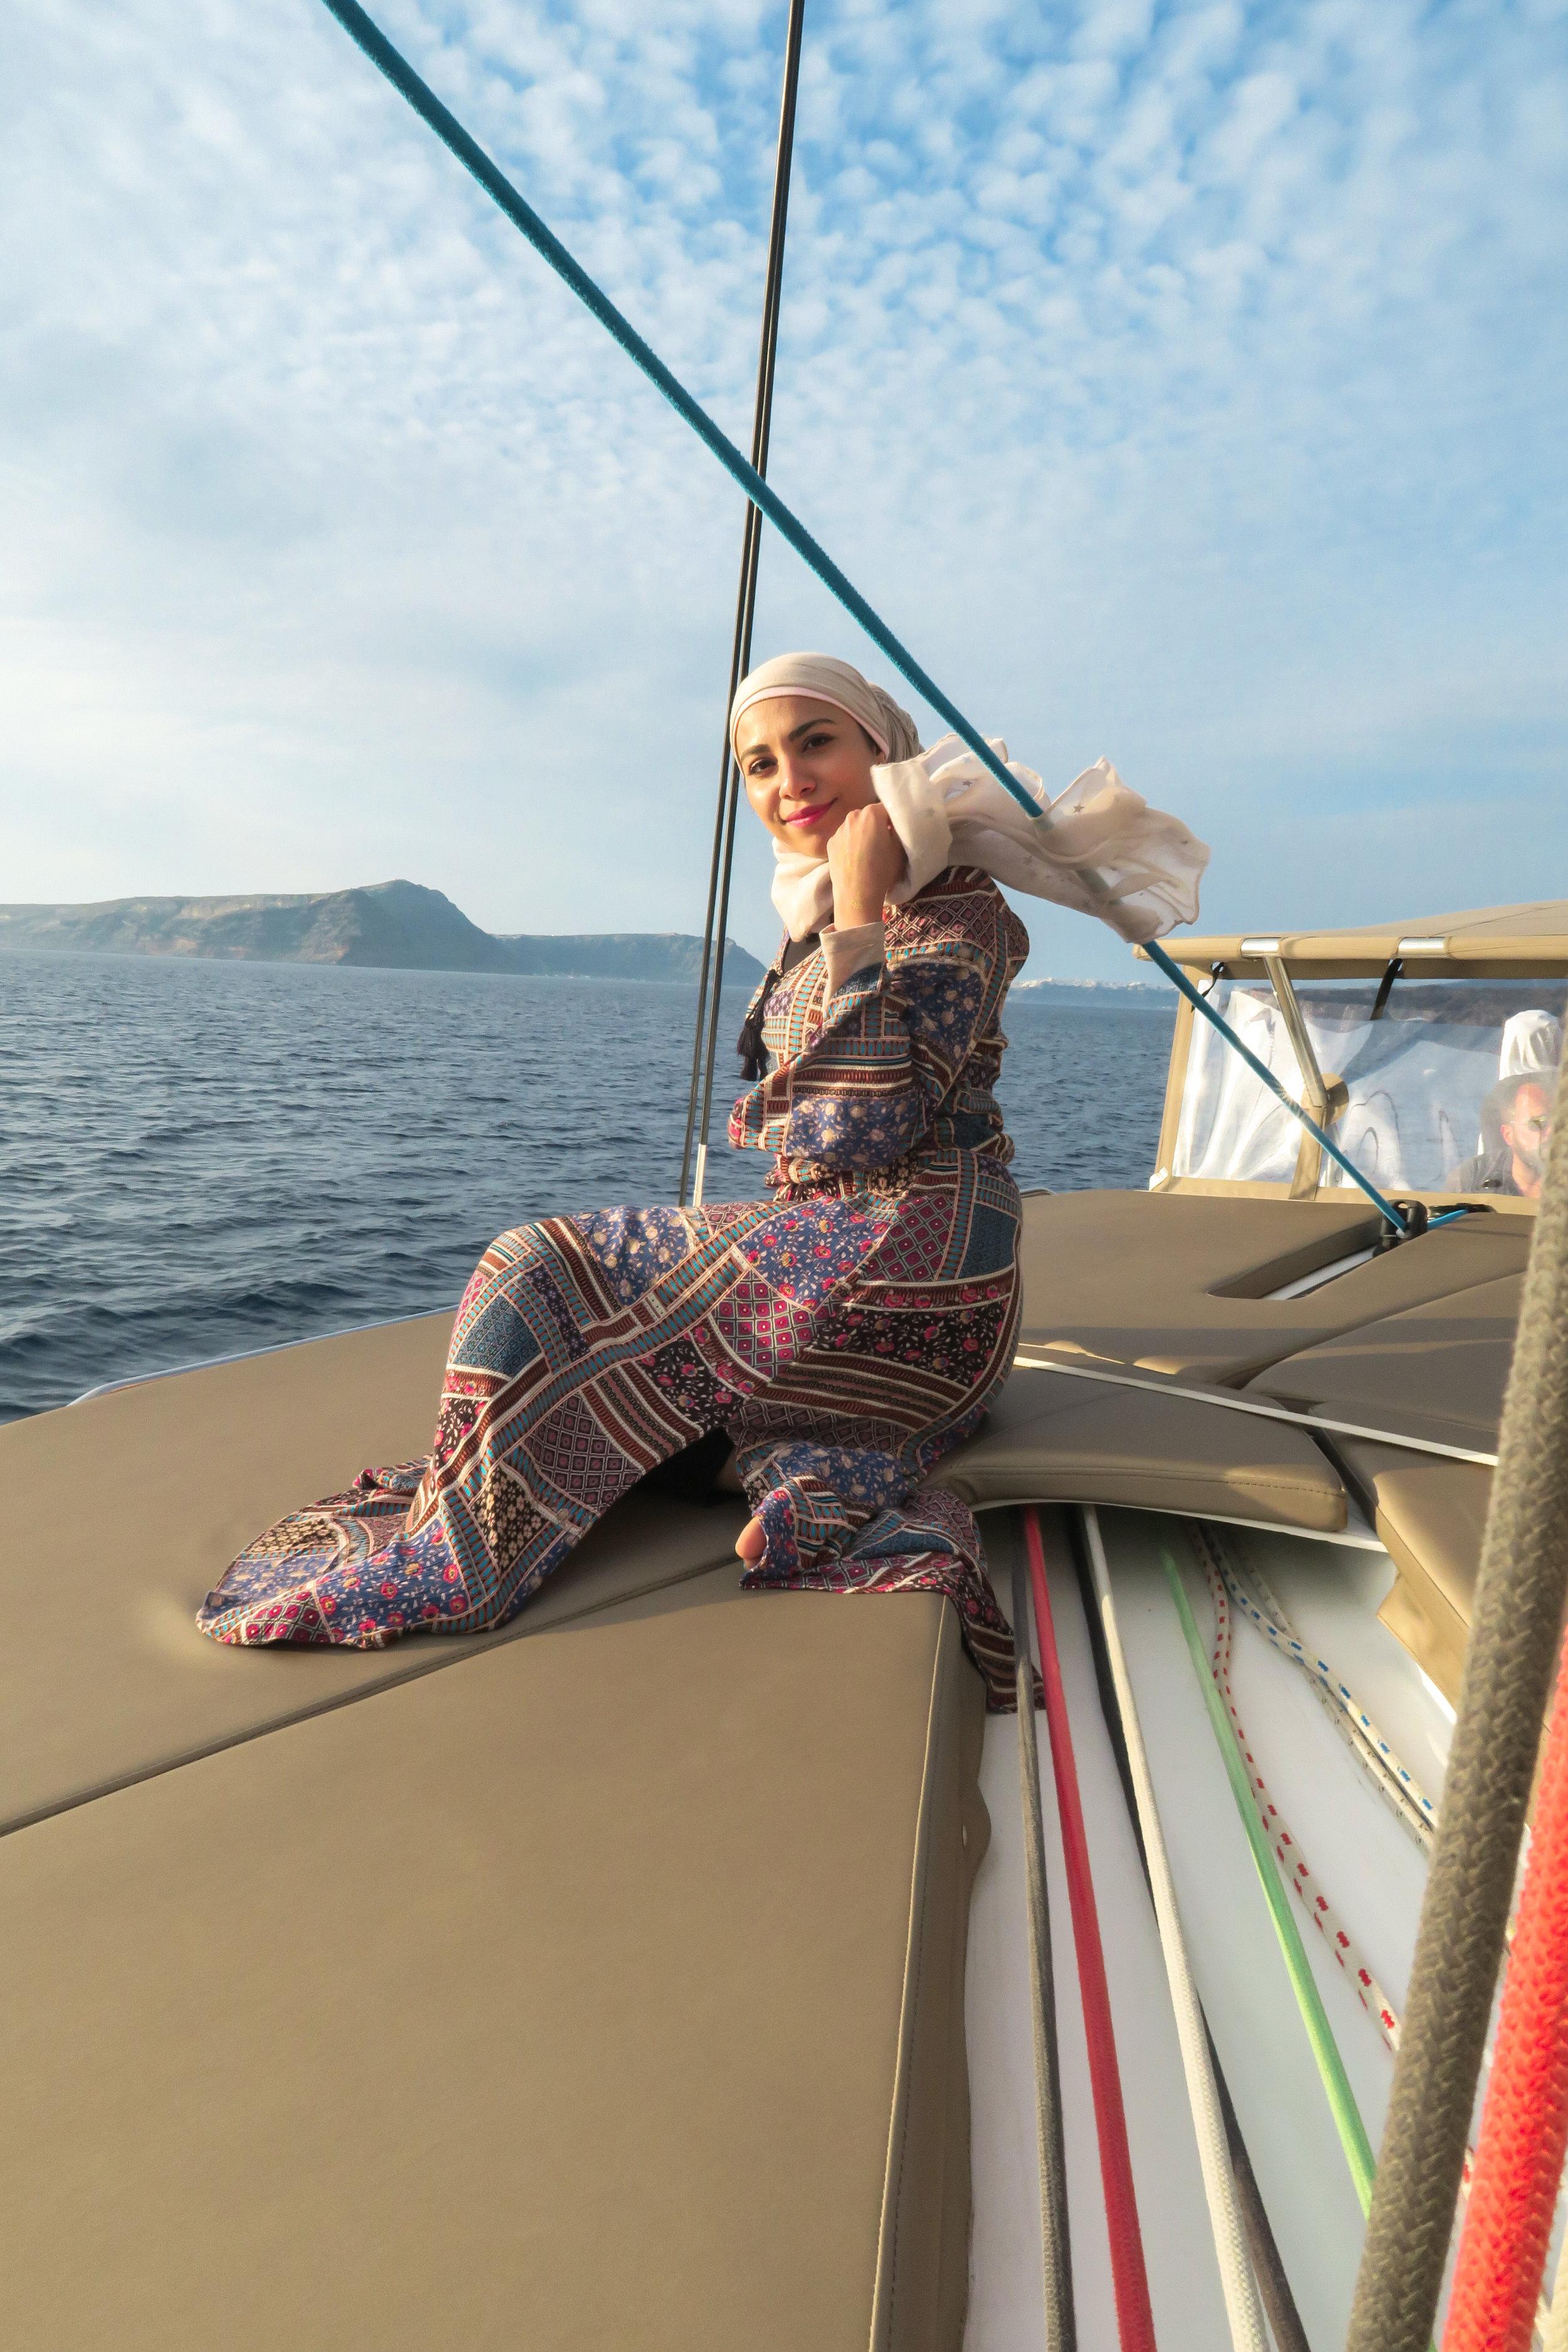 Is a boat trip worth it in Santorini? -